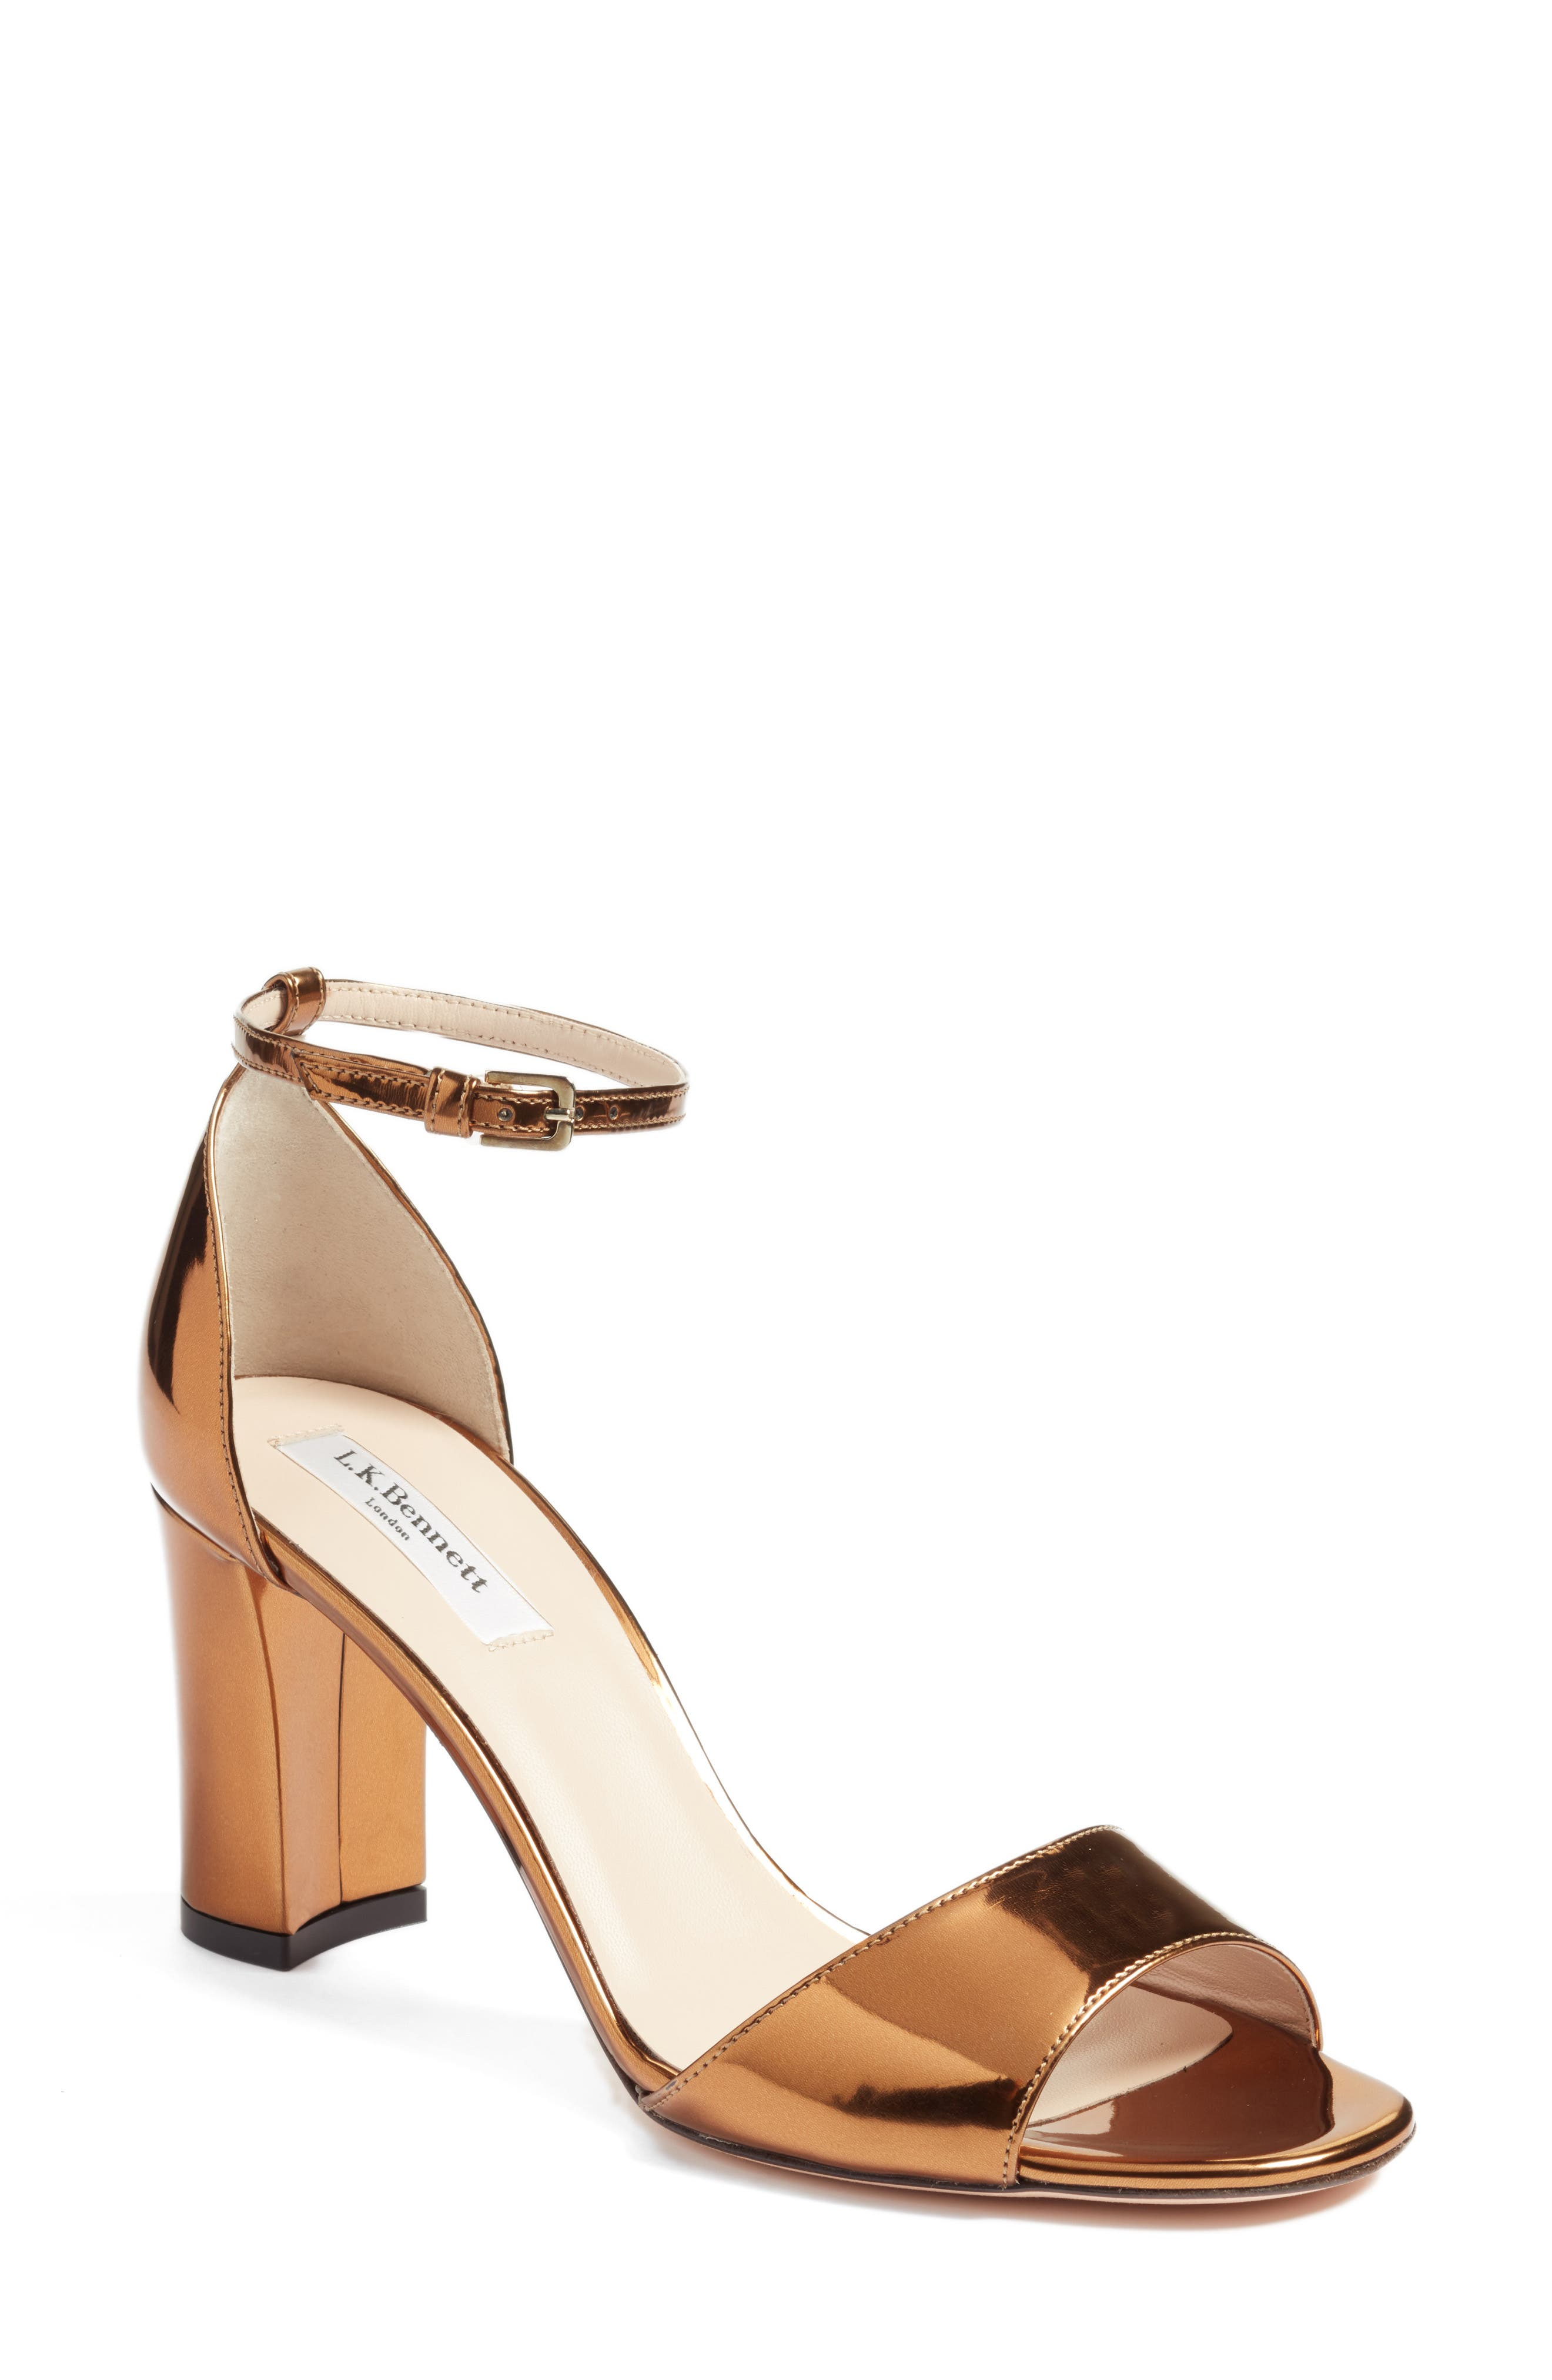 'Helena' Ankle Strap Block Heel Sandal,                             Main thumbnail 1, color,                             710